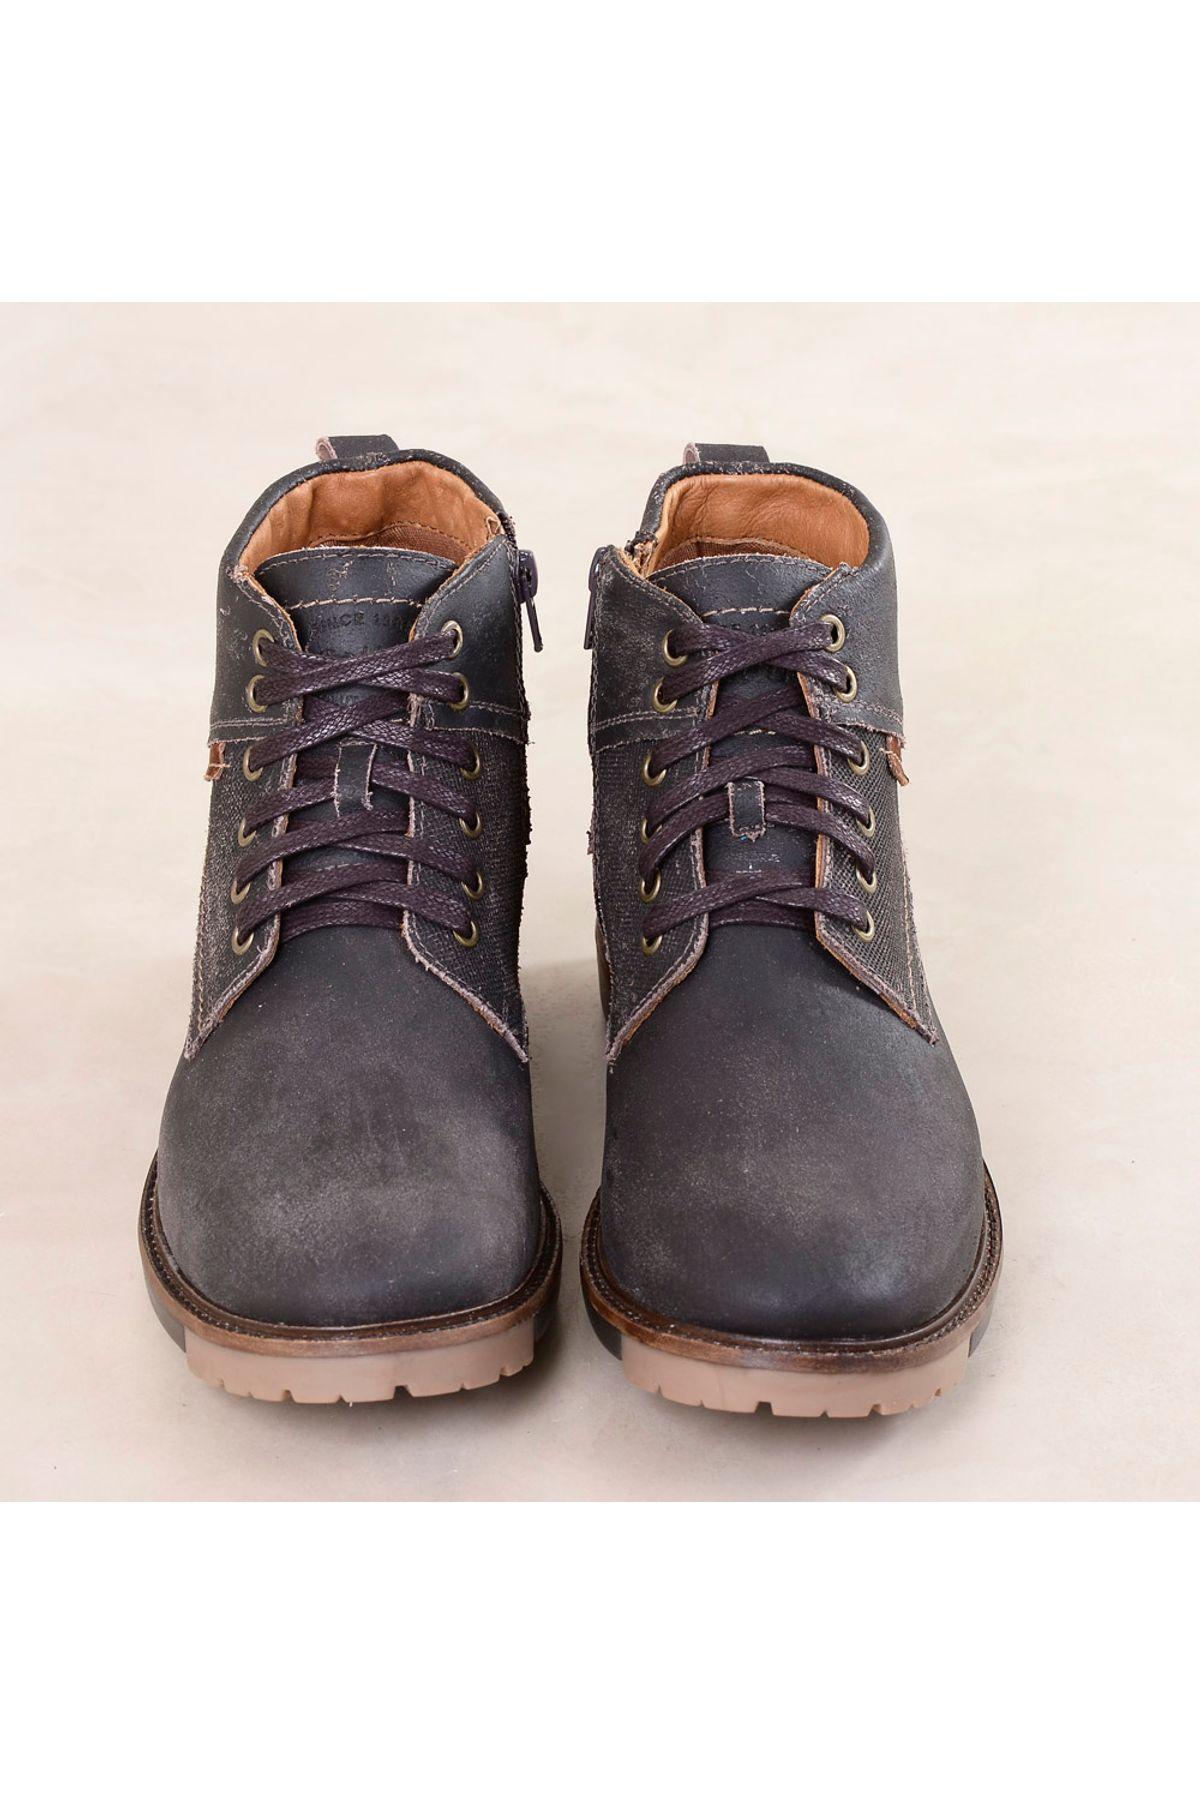 4ba6c748f Bota Masculina Sollu Logan | Mundial Calçados - Mundial Calçados